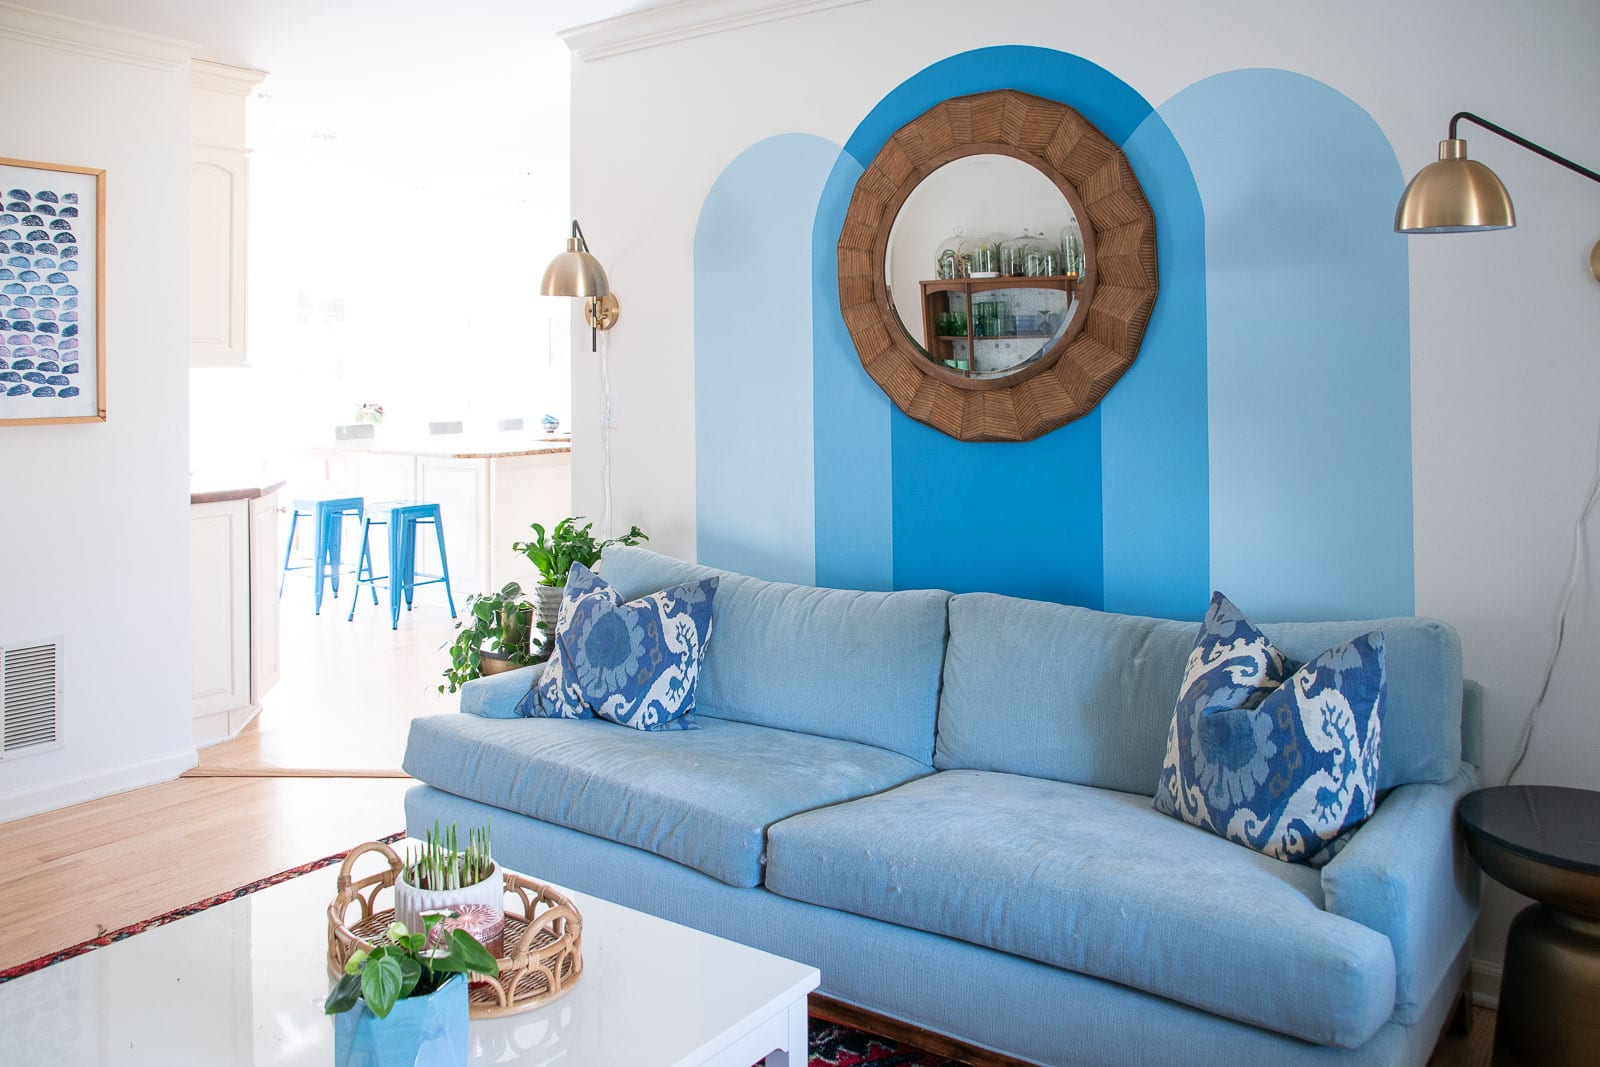 painted blue mural